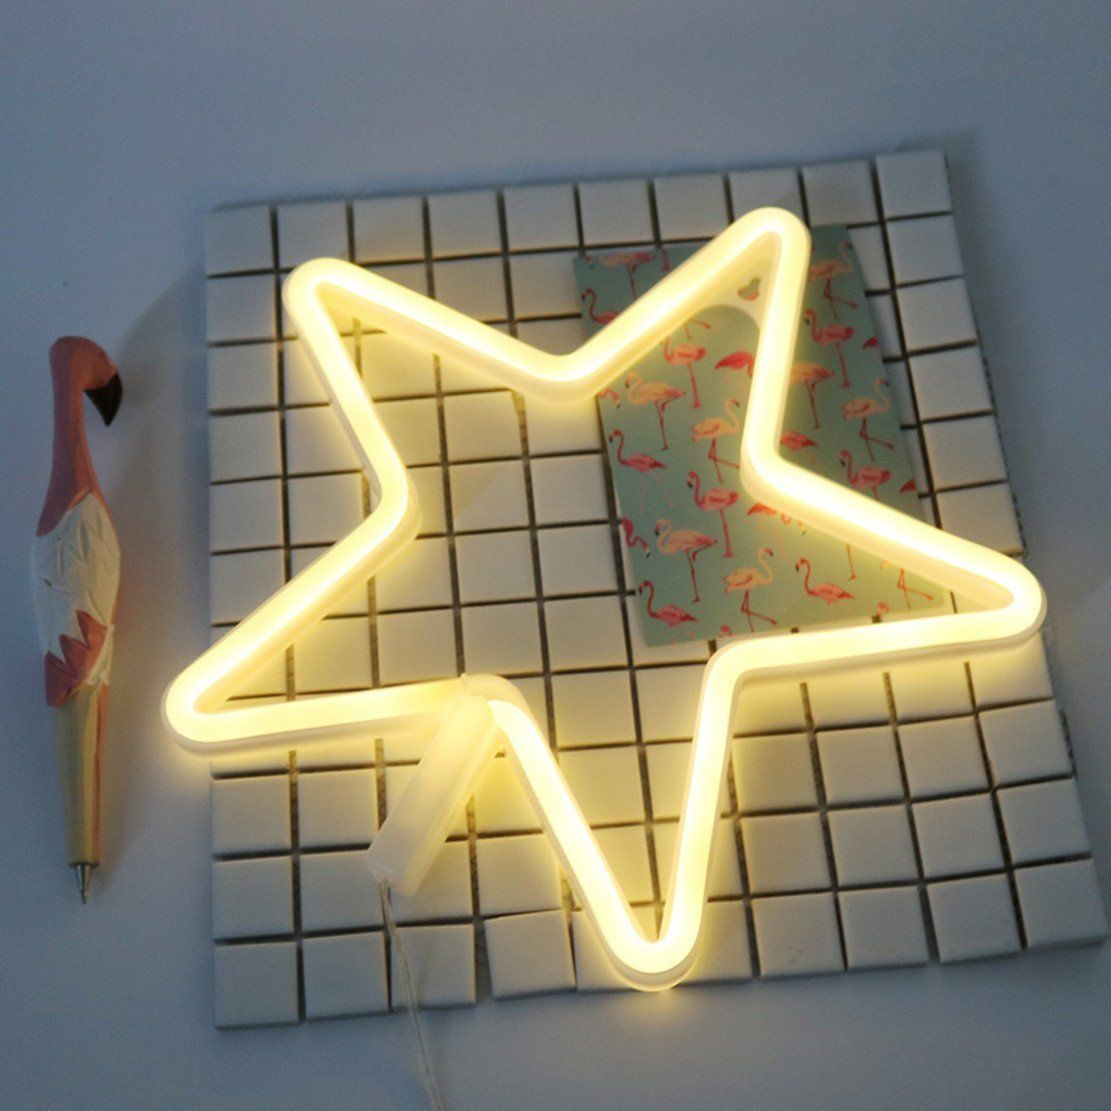 Neon Light,LED Star Sign Shaped Decor Light,Wall Decor for ...